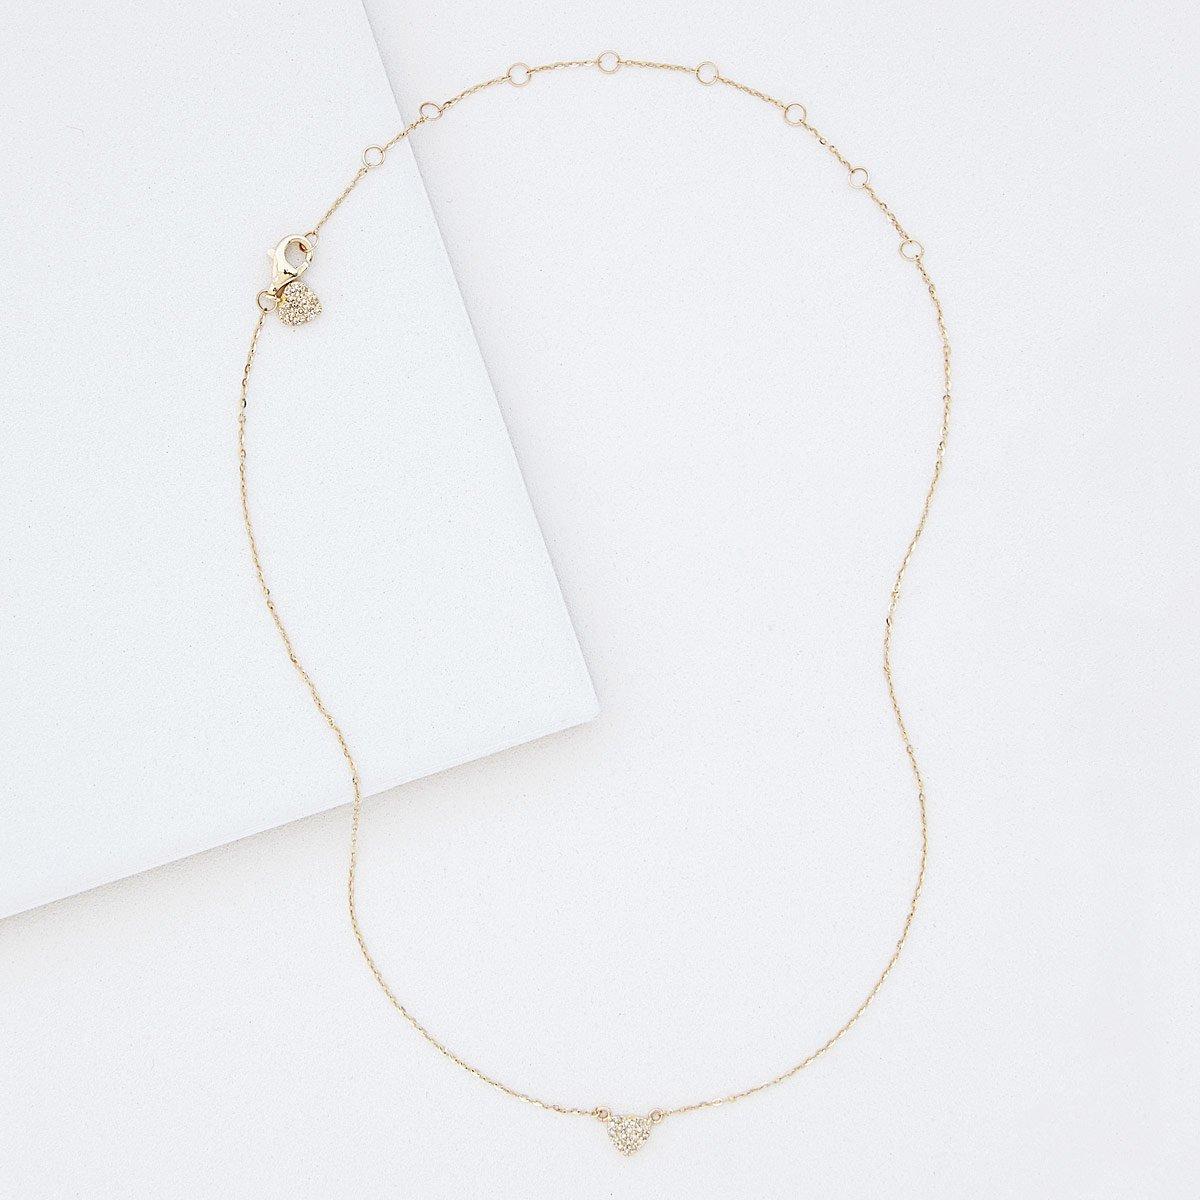 Double Heart Diamond Necklace | UncommonGoods